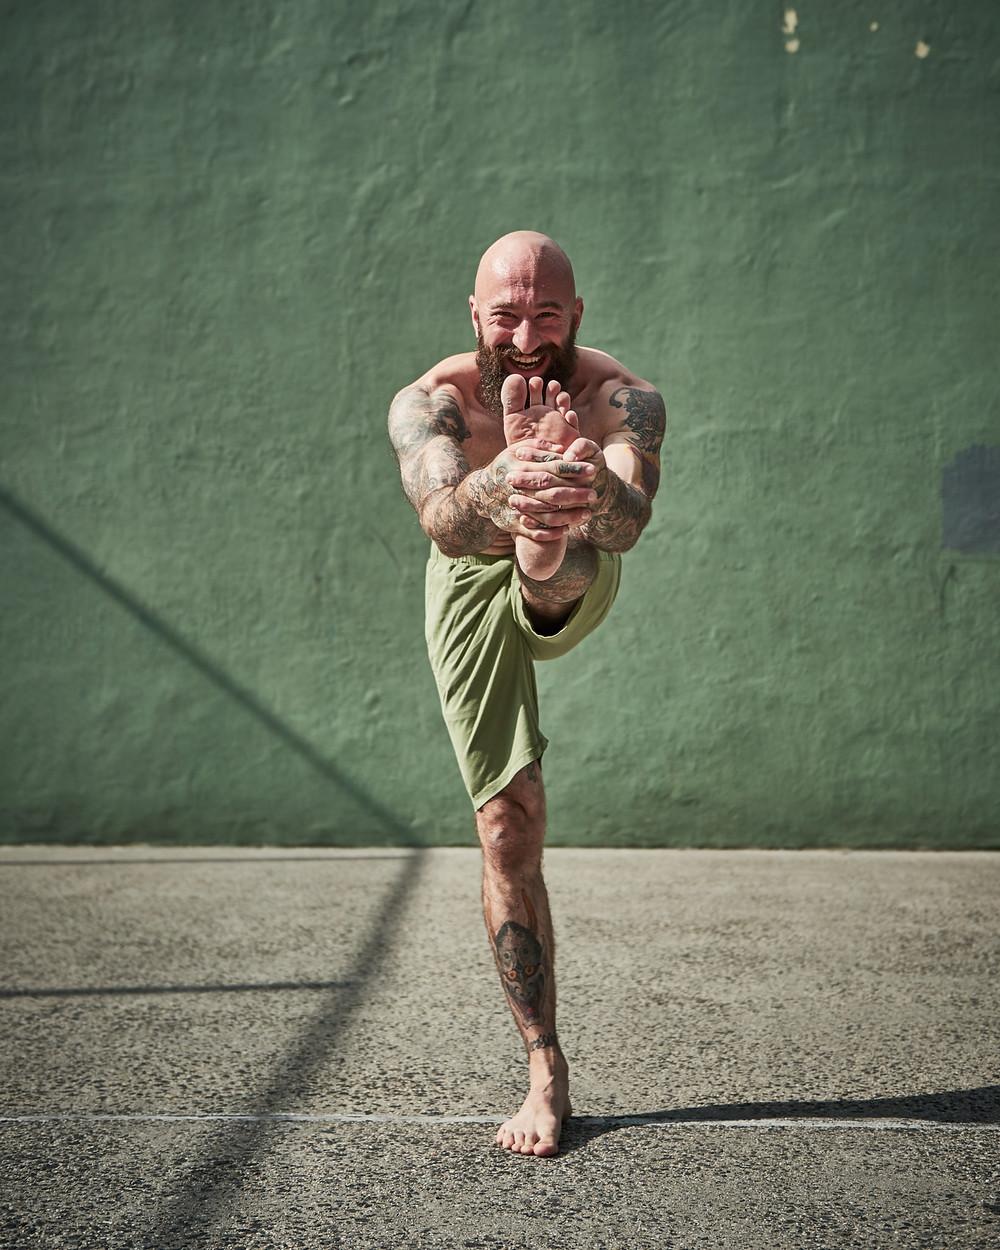 Organic cotton yoga shorts by So We Flow, Men's yoga & movement clothing